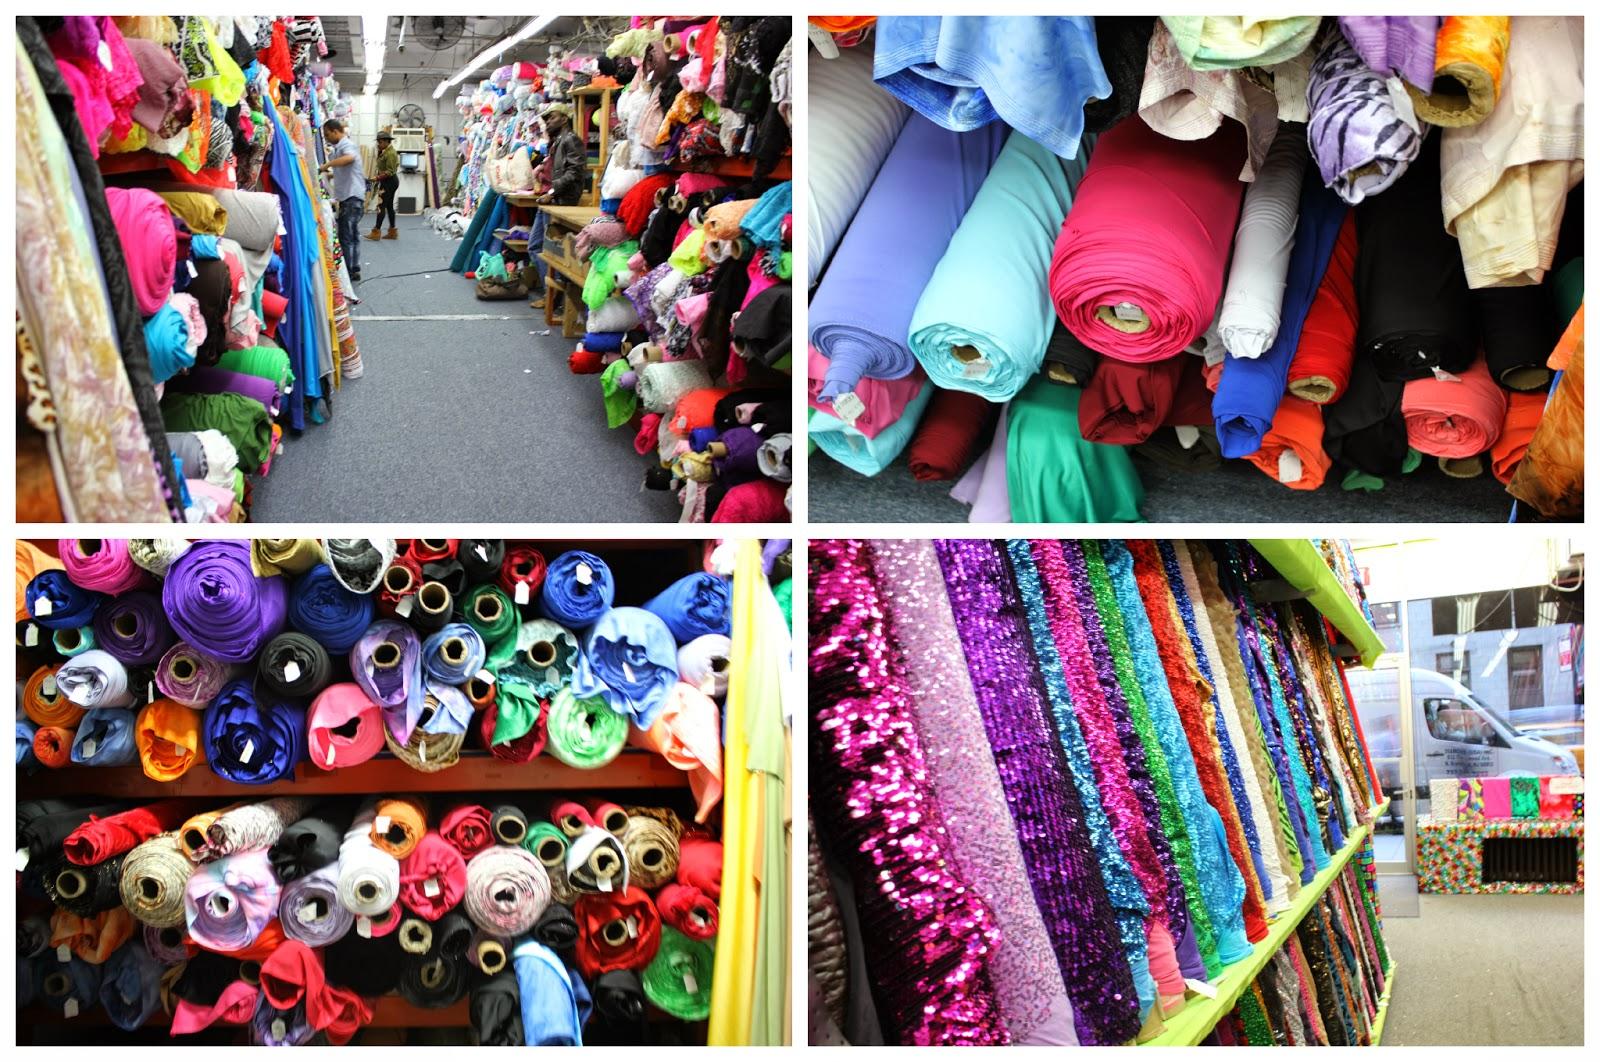 Comprar telas para vestidos por internet for Donde venden cortinas